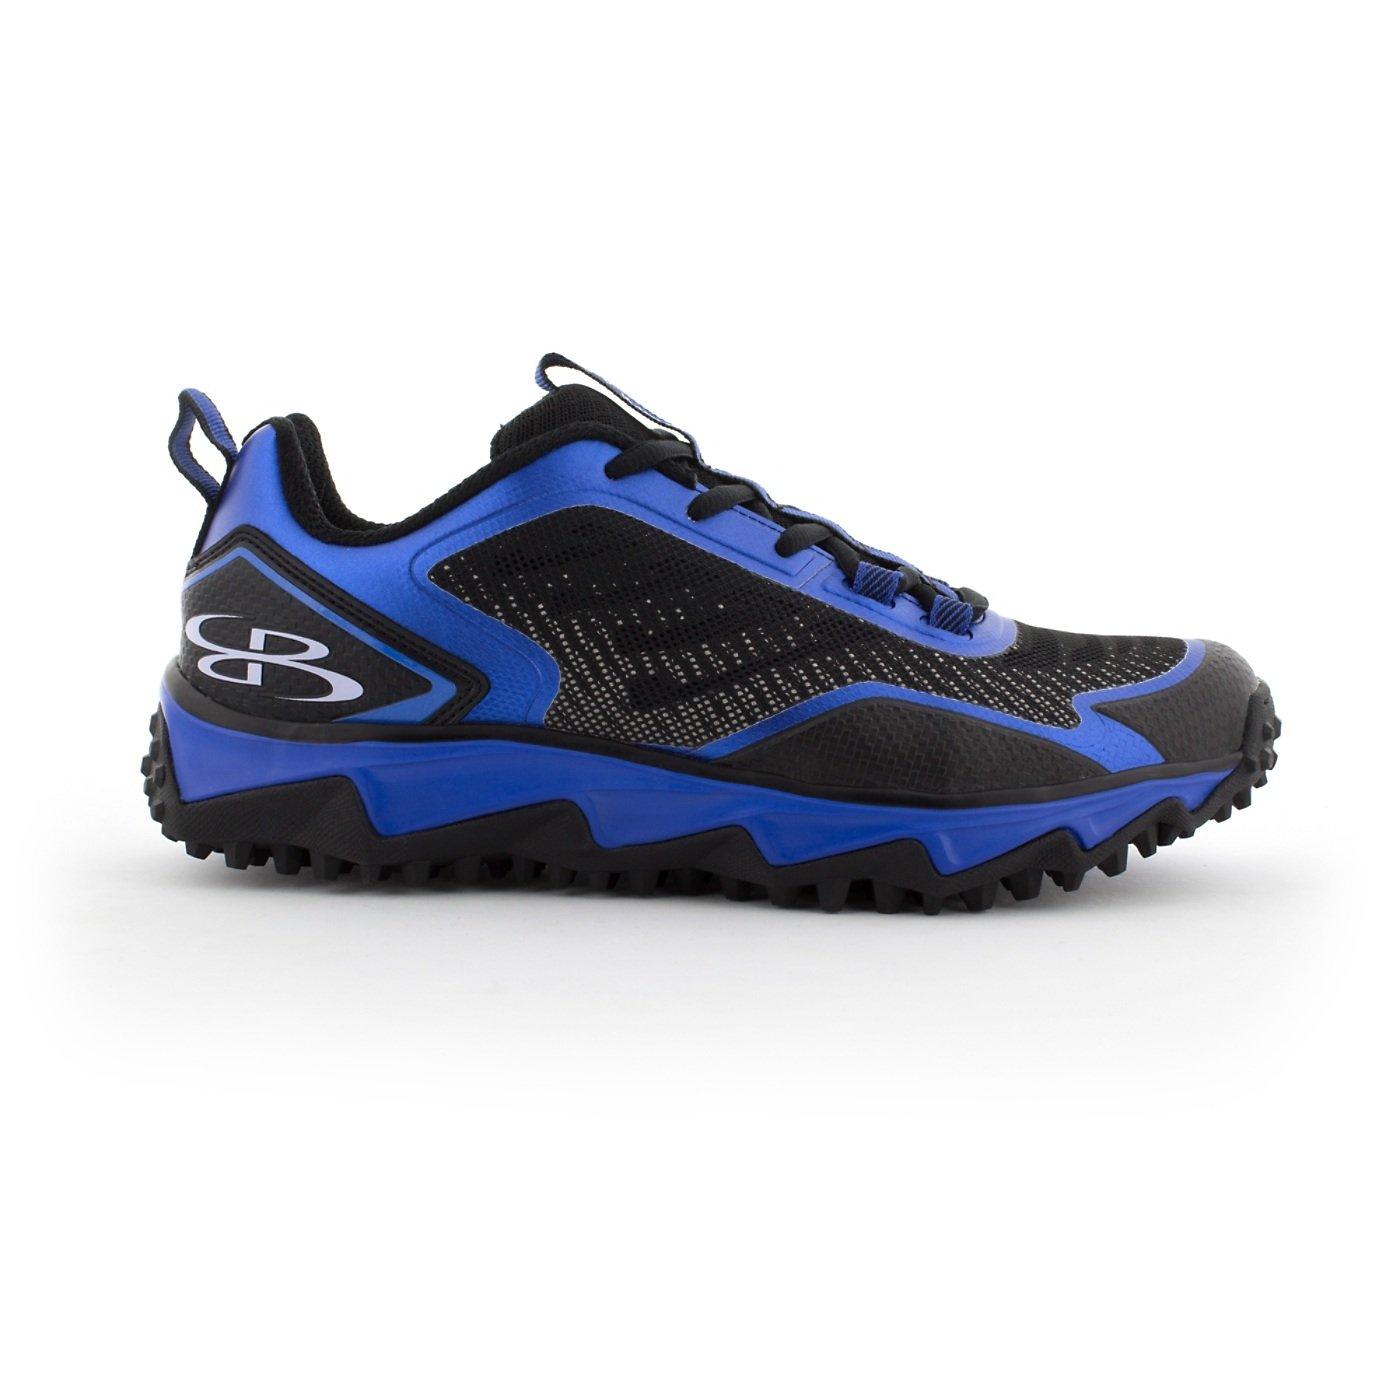 BoombahメンズBerzerk Turf Shoes – 13色オプション – 複数のサイズ B0769Y66V6 6.5|ブラック/ロイヤル(royal) ブラック/ロイヤル(royal) 6.5